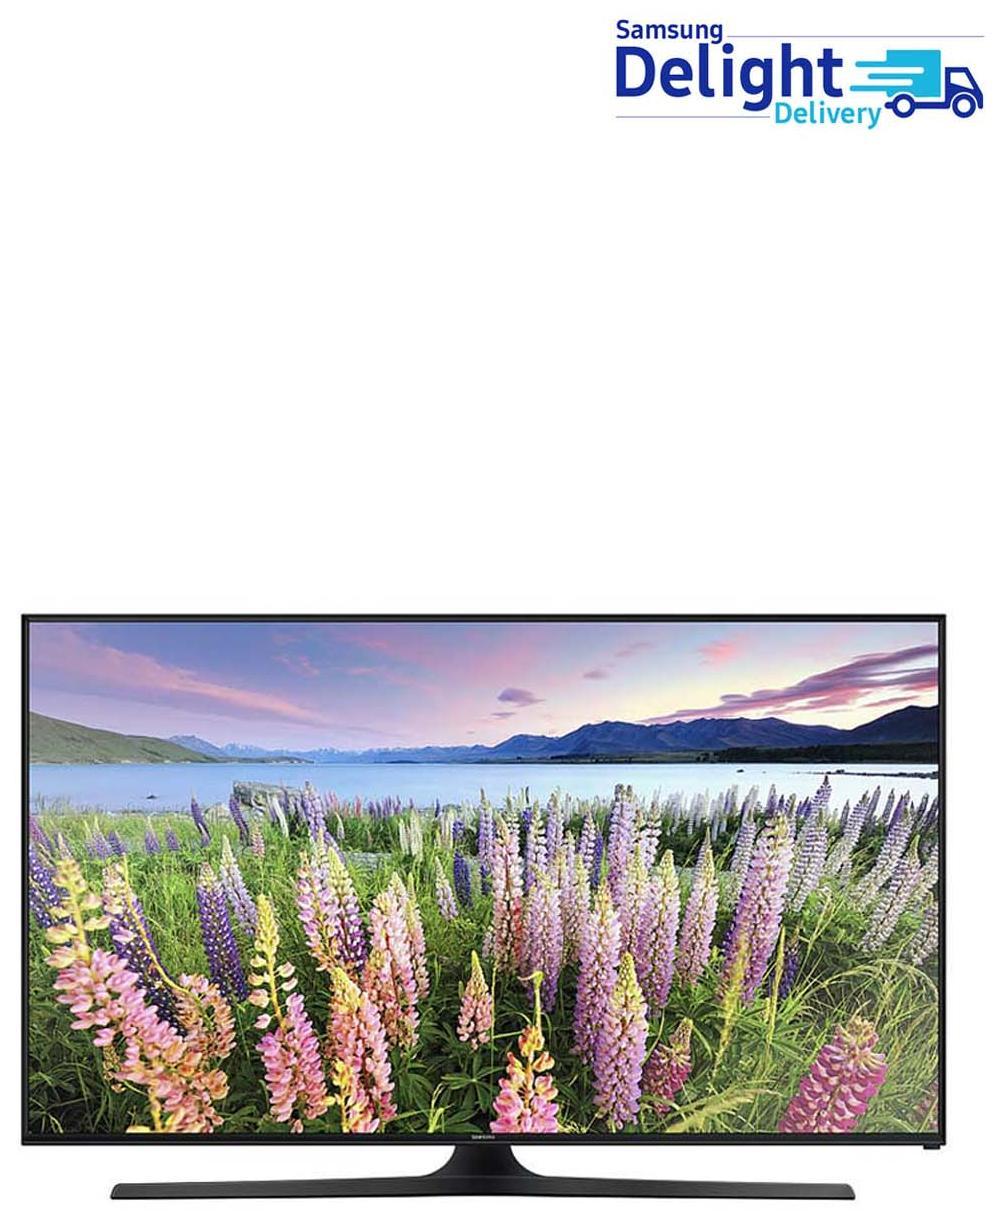 Samsung 40 Inches Full HD LED Smart TV (40J5300, Black)